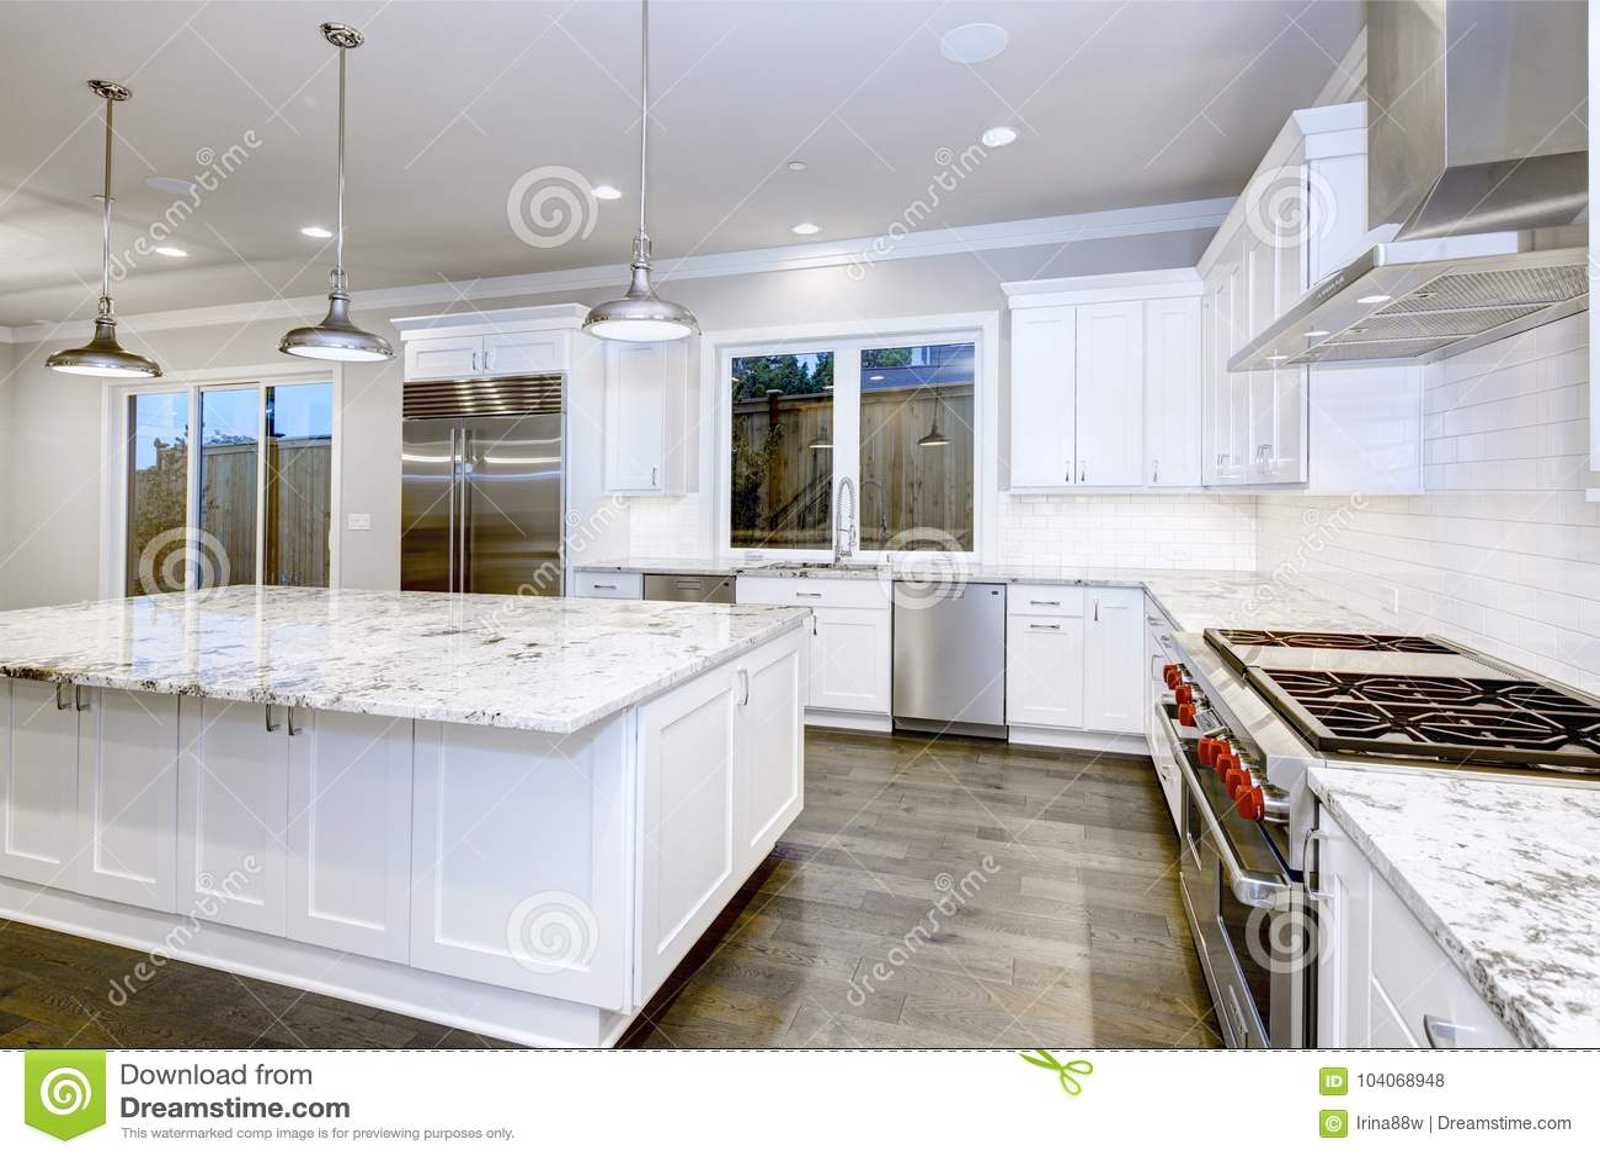 white kitchen cabinets kohler faucet repair 与白色厨柜的大 宽敞厨房设计库存照片 图片包括有顶层 凳子 最高限额 宽敞厨房设计